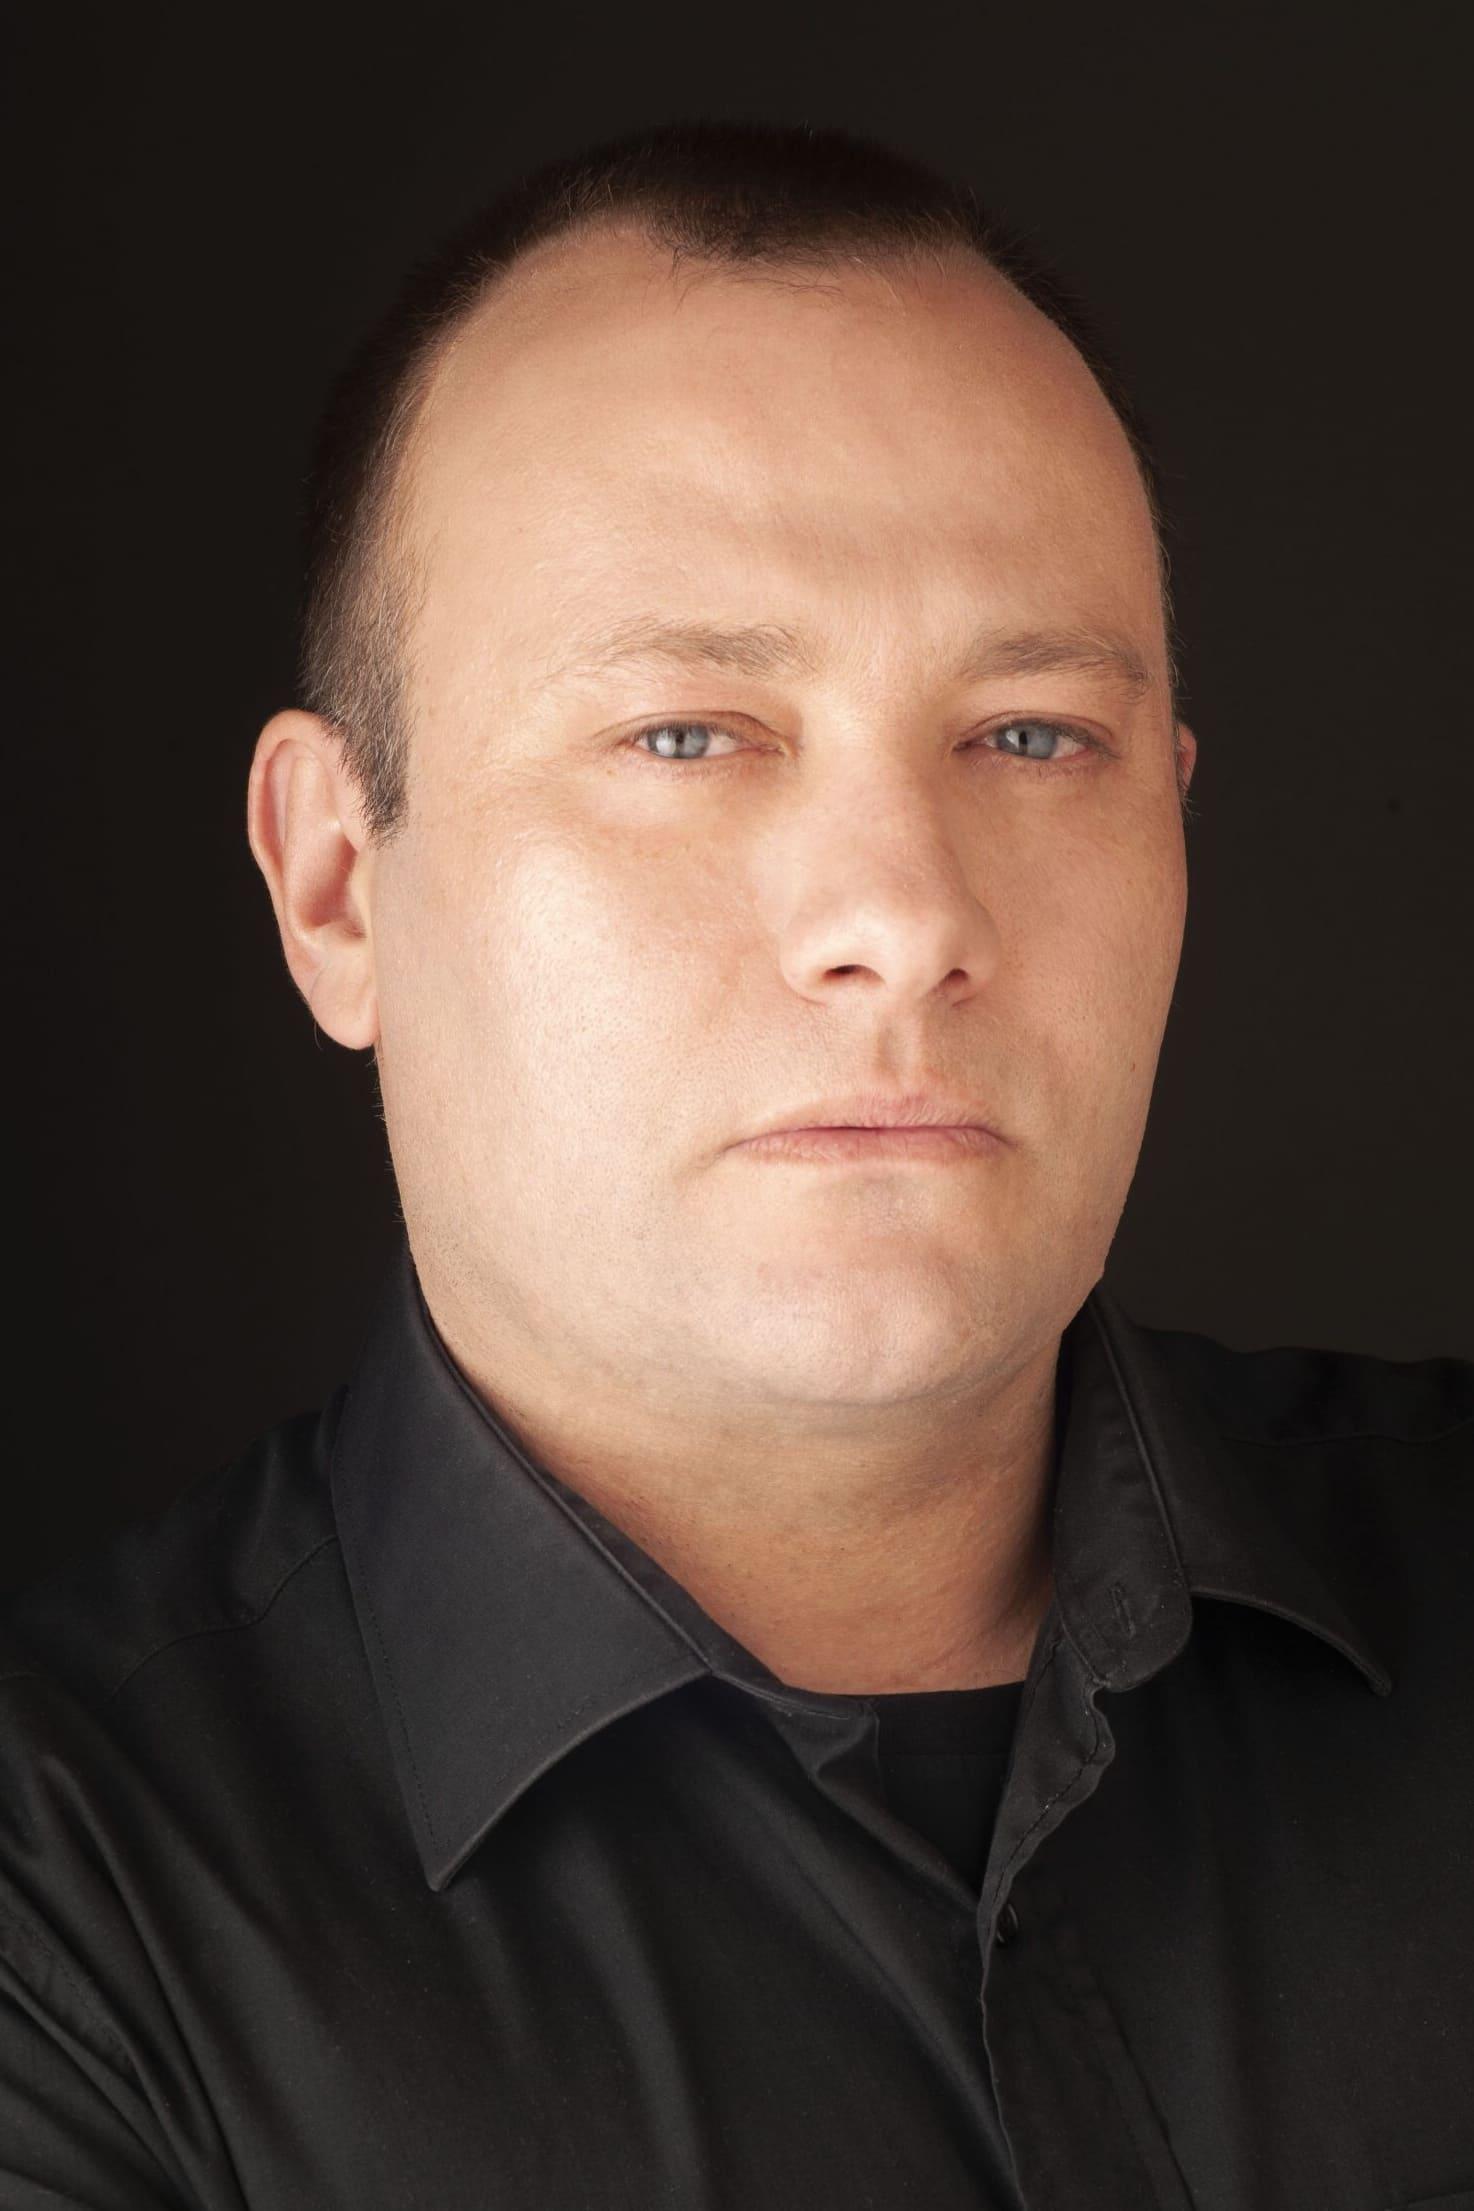 Hugo Mestre Amaro